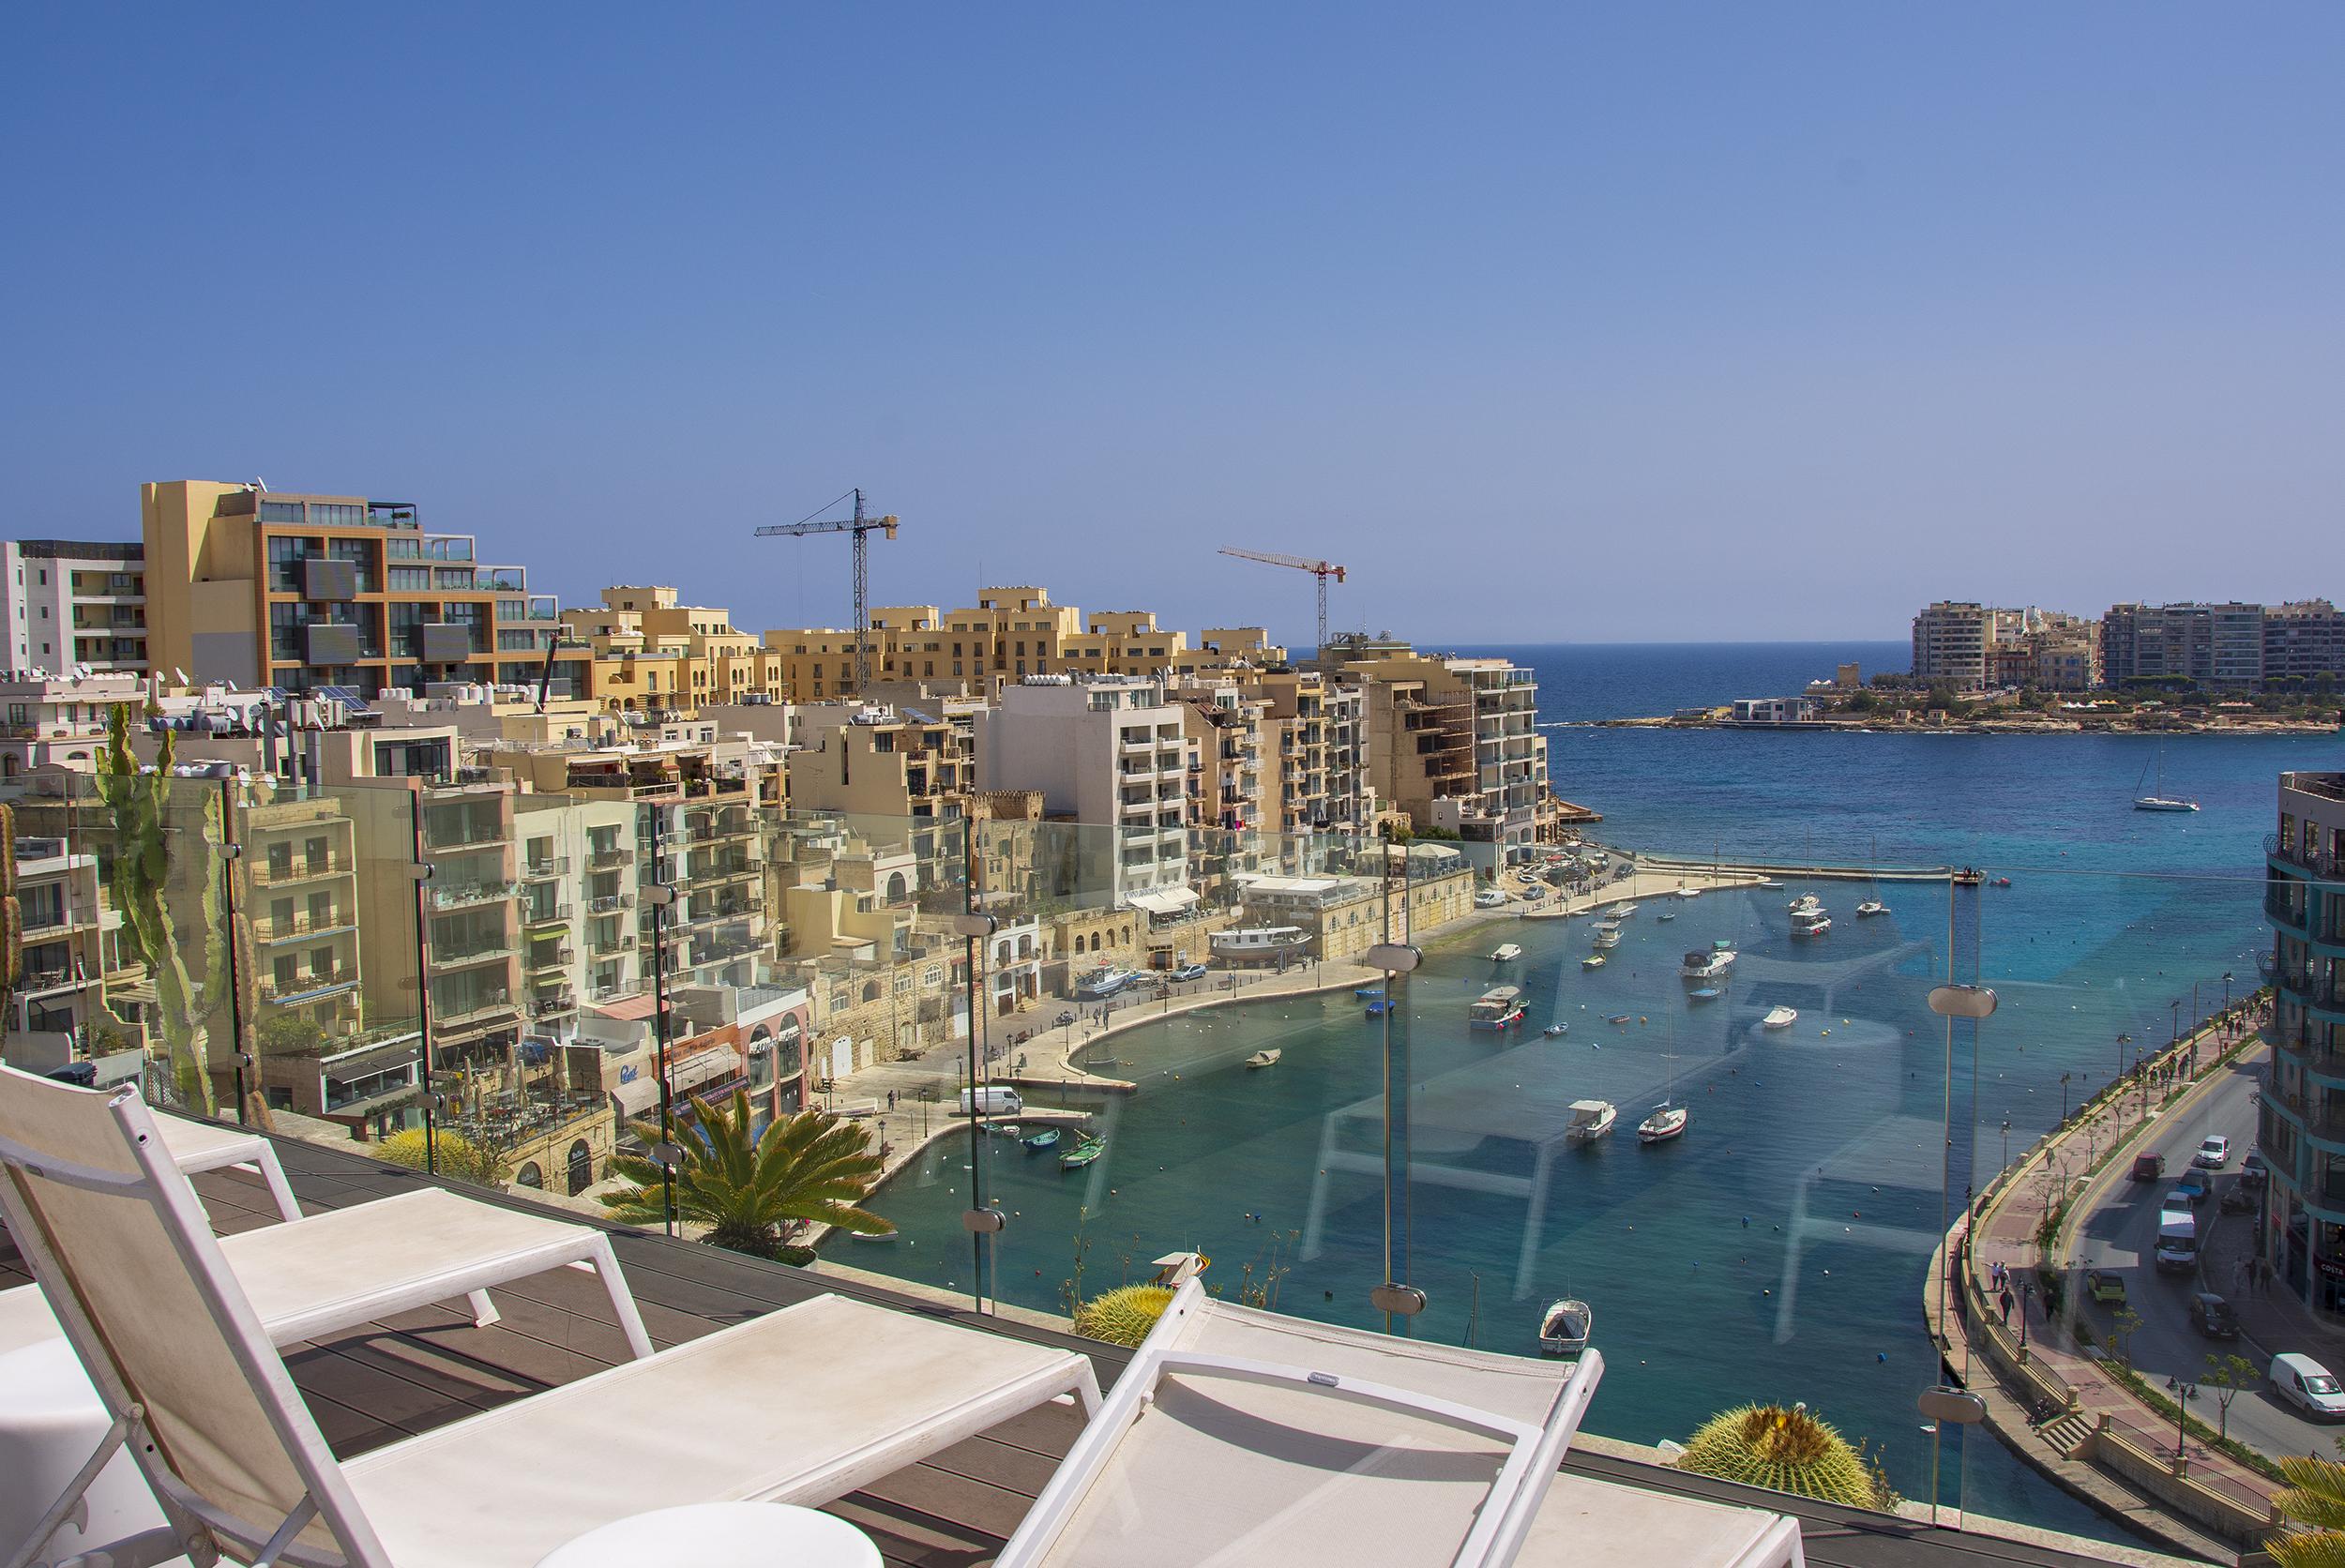 hotel juliani malta utsikt taket solstolar